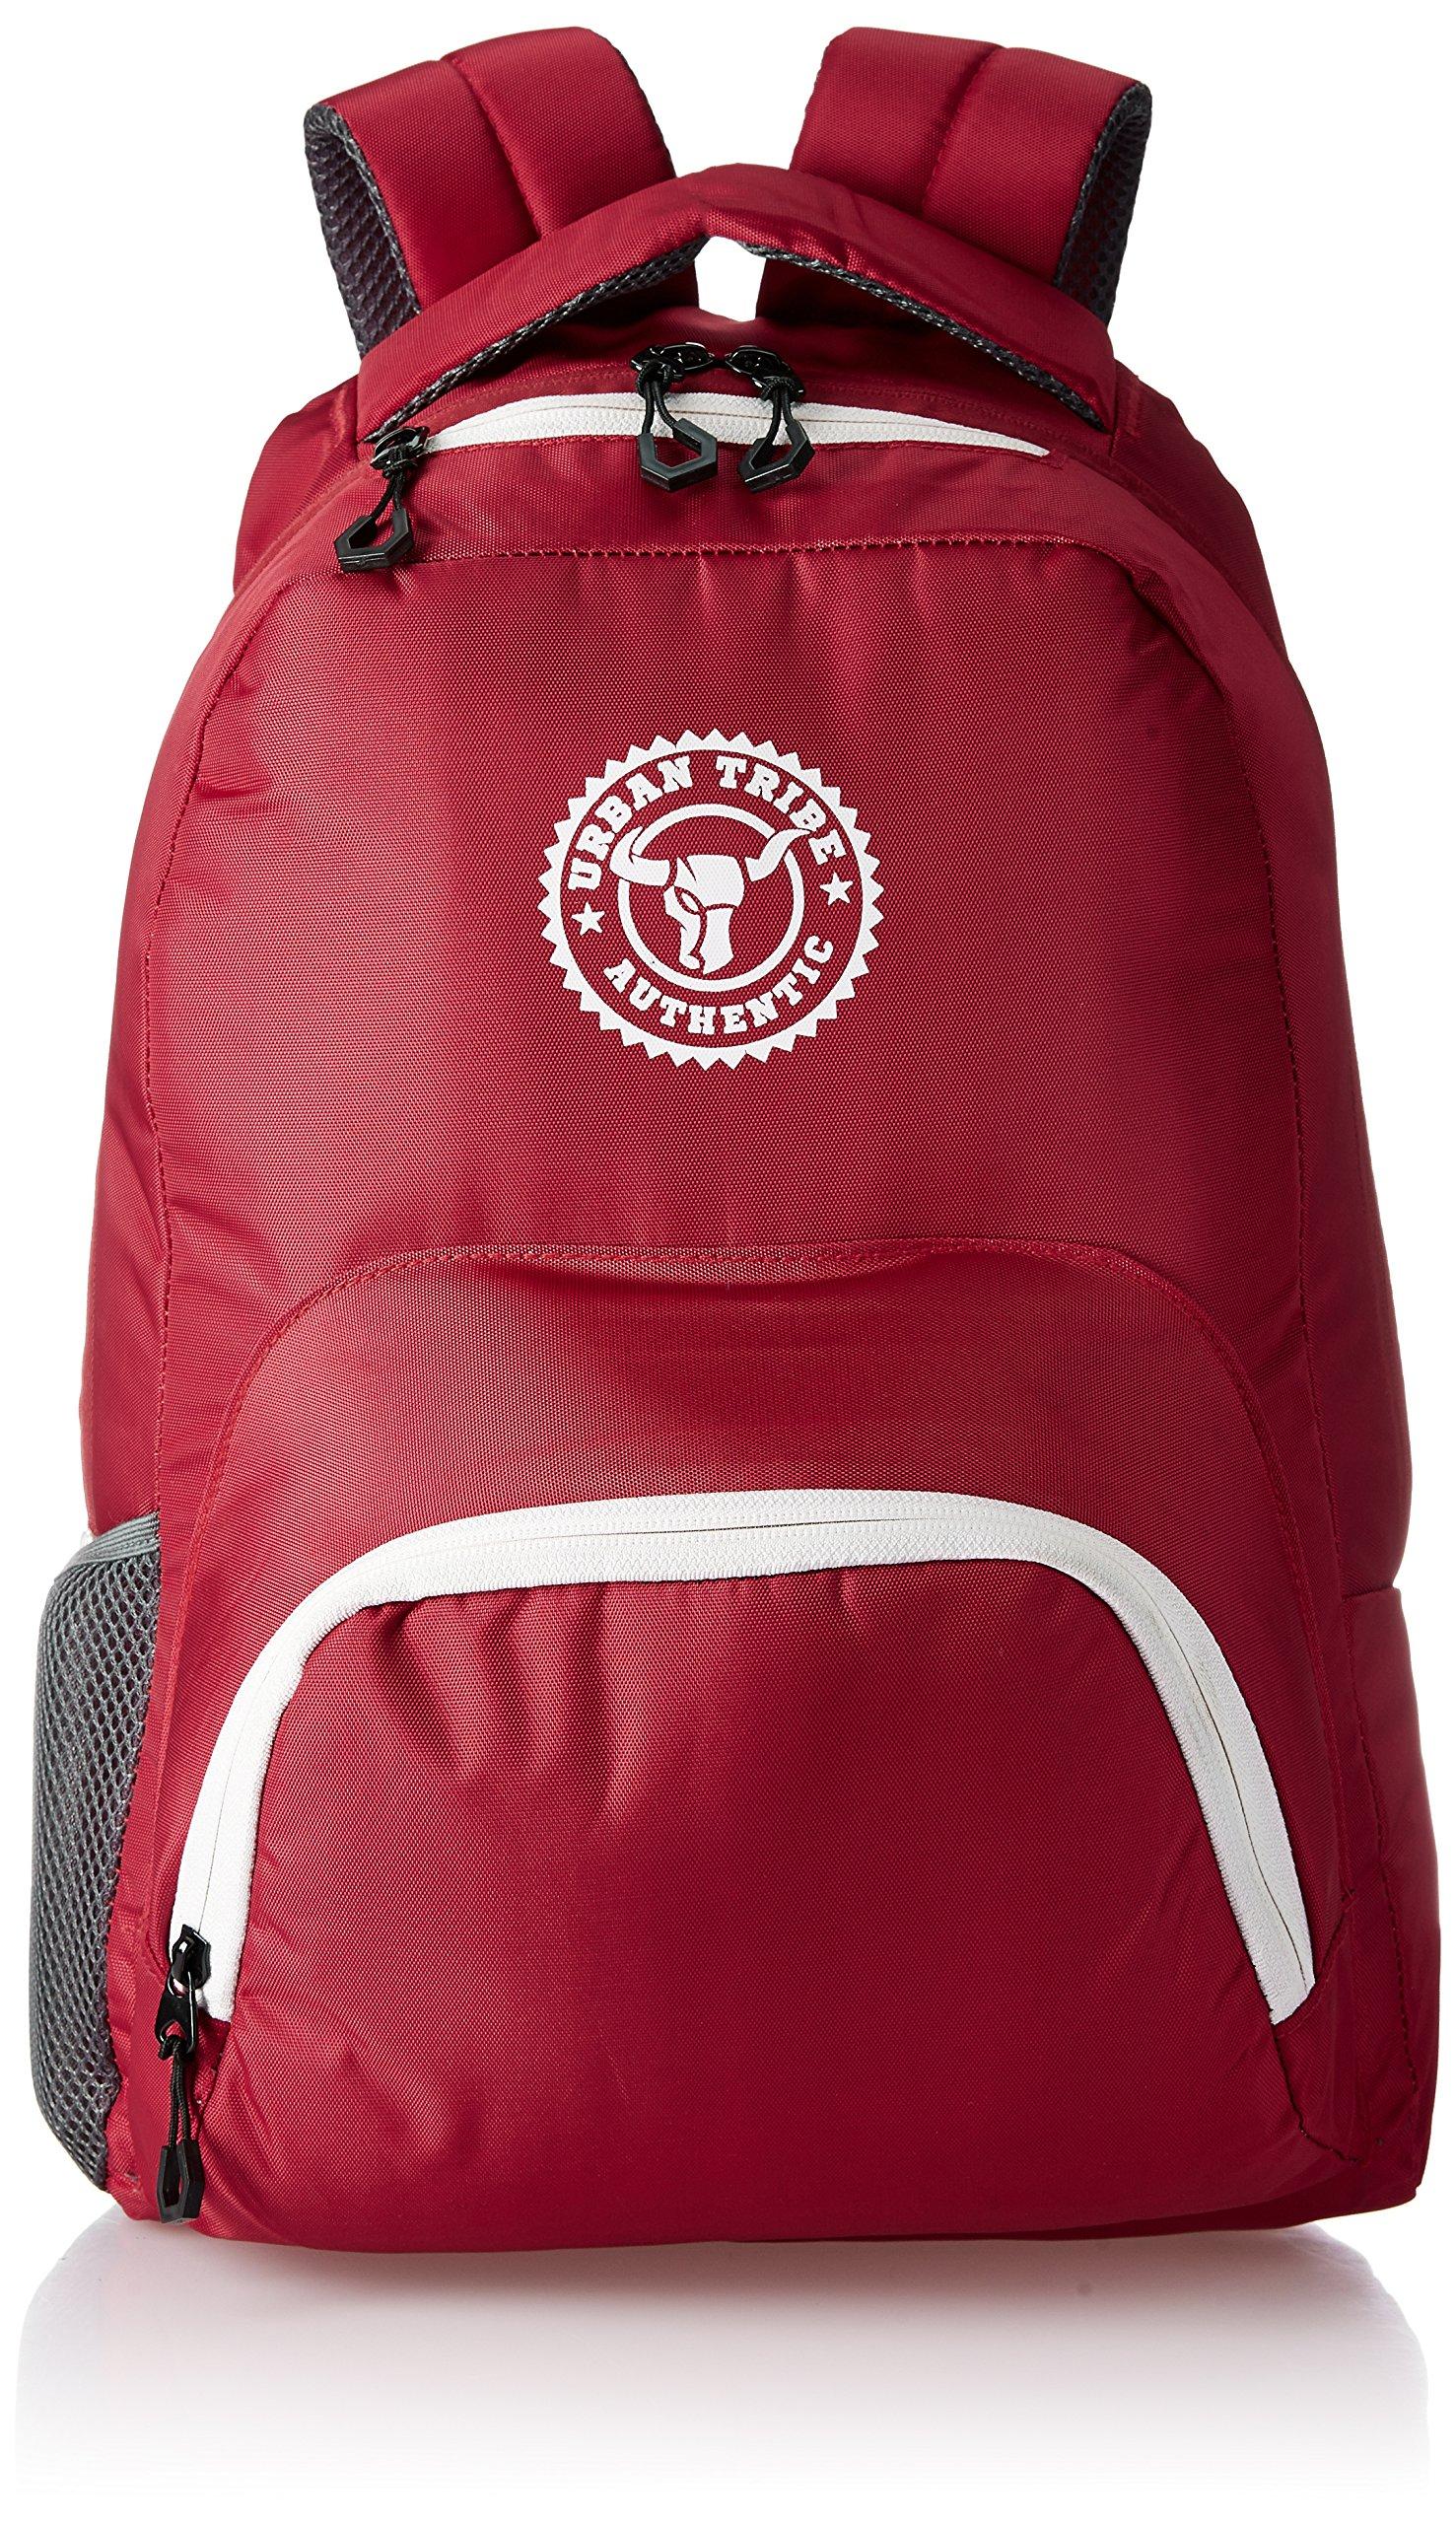 Urban Tribe Street Hawk 24 litres Red Laptop Backpack (B01LH9CQYK) Amazon Price History, Amazon Price Tracker